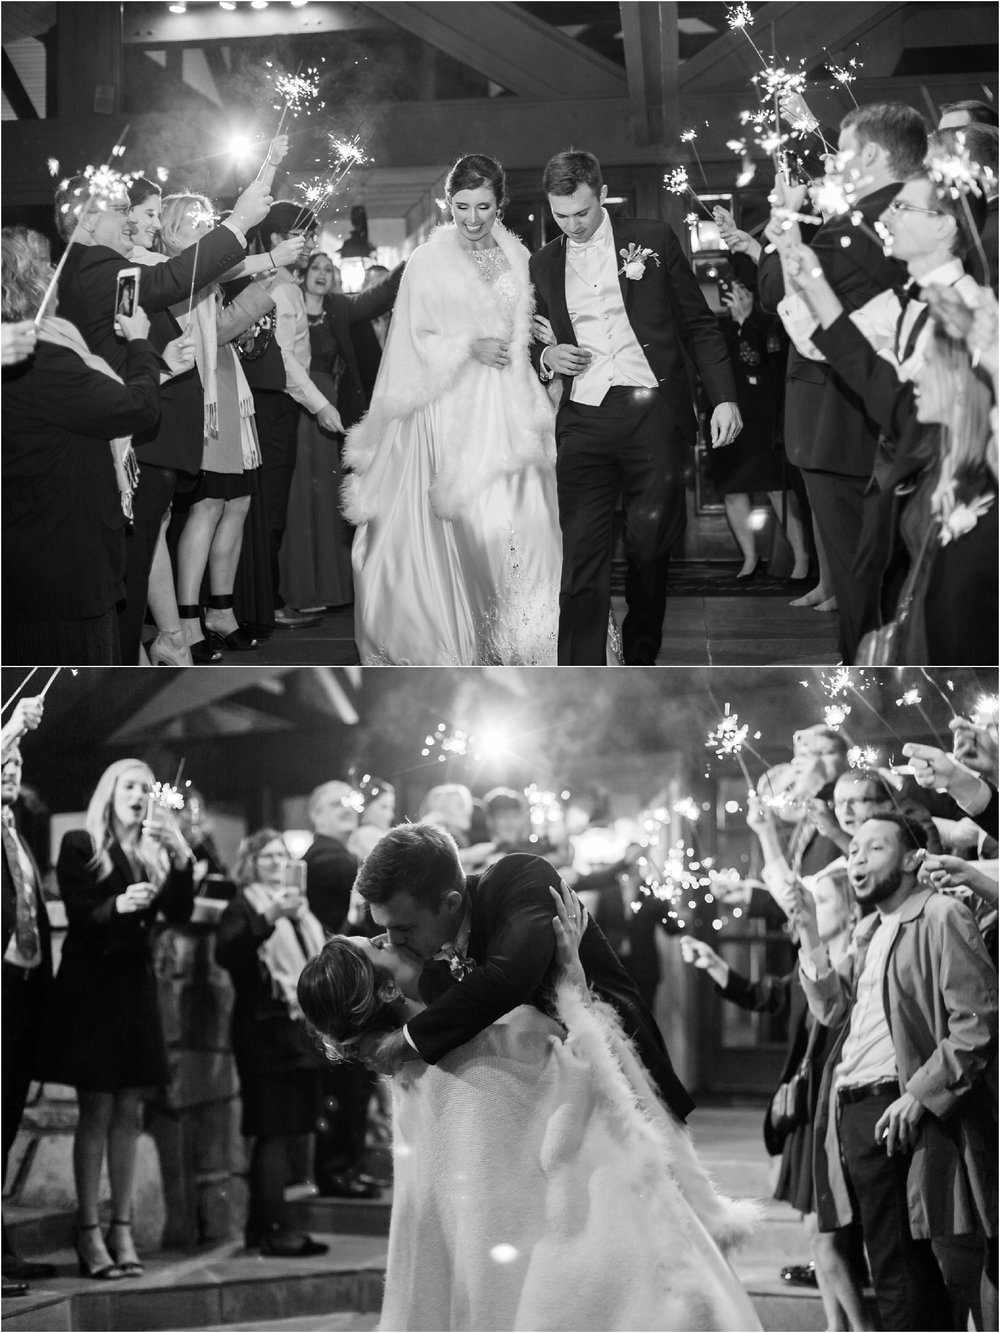 Savannah Eve Photography- Bottiglion-Scope Wedding- Sneak Peek-122.jpg